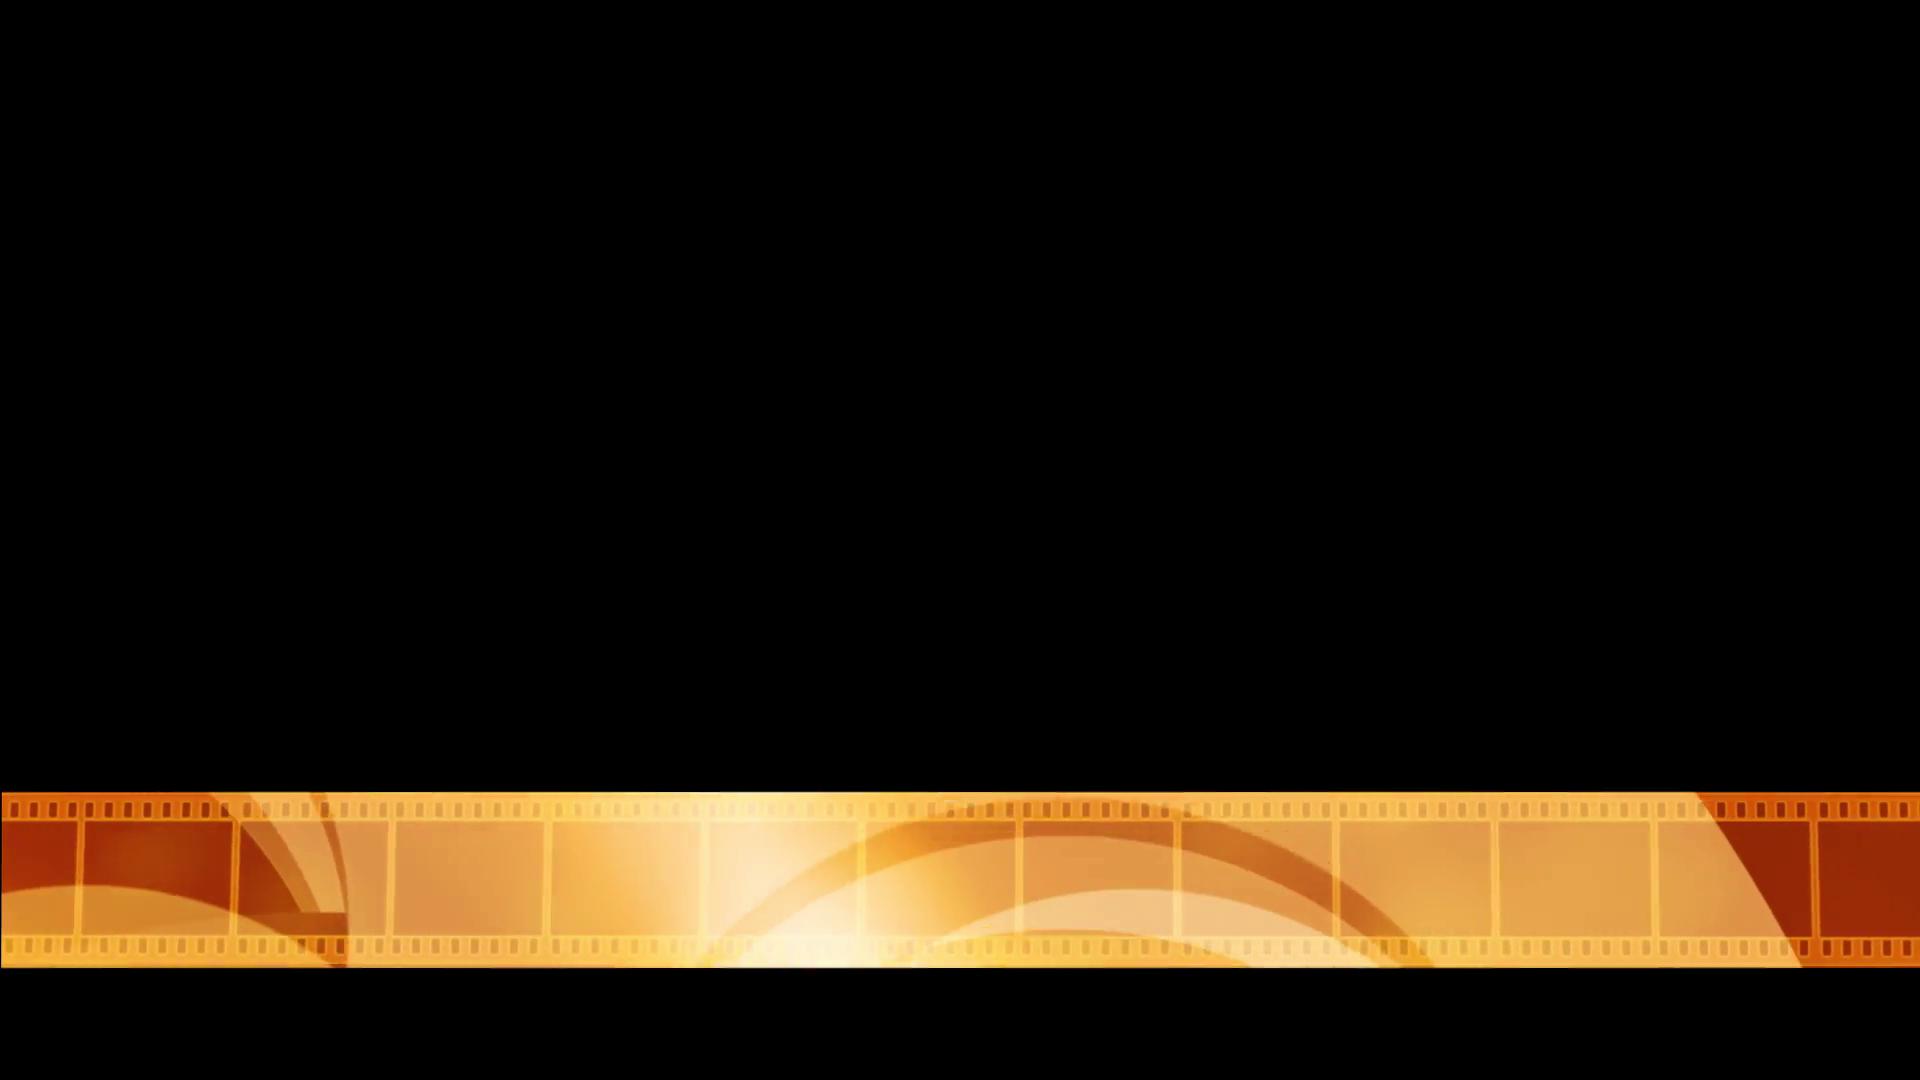 Golden Reel Lower Third Stock Video Footage Videoblocks